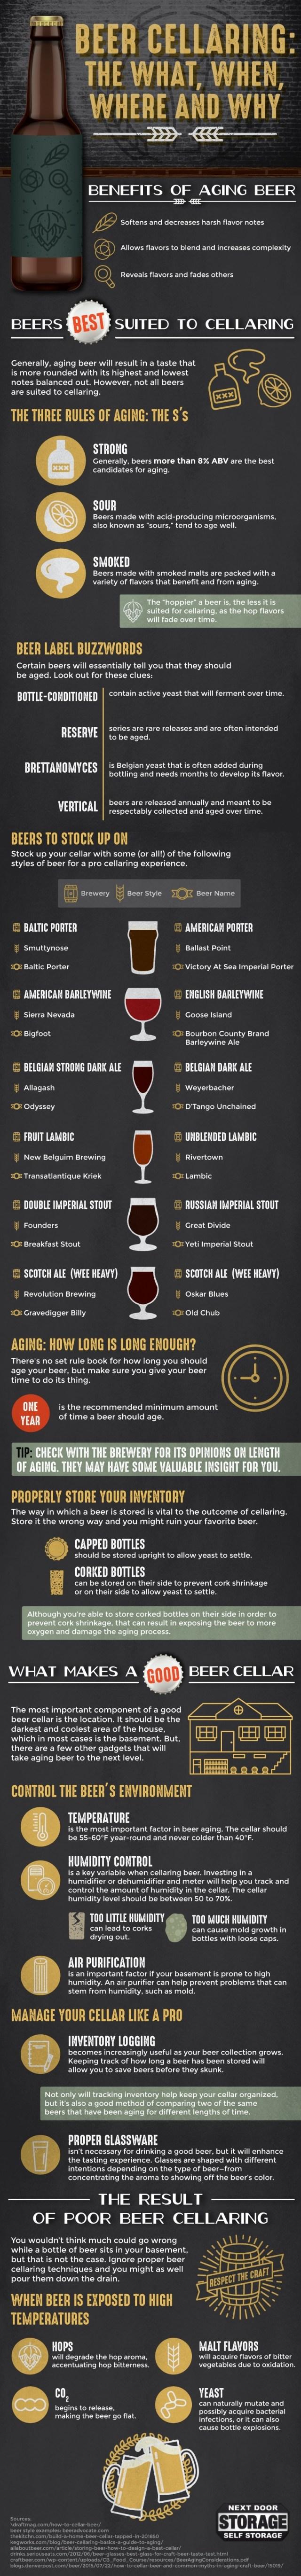 Beer-Cellaring-1-15